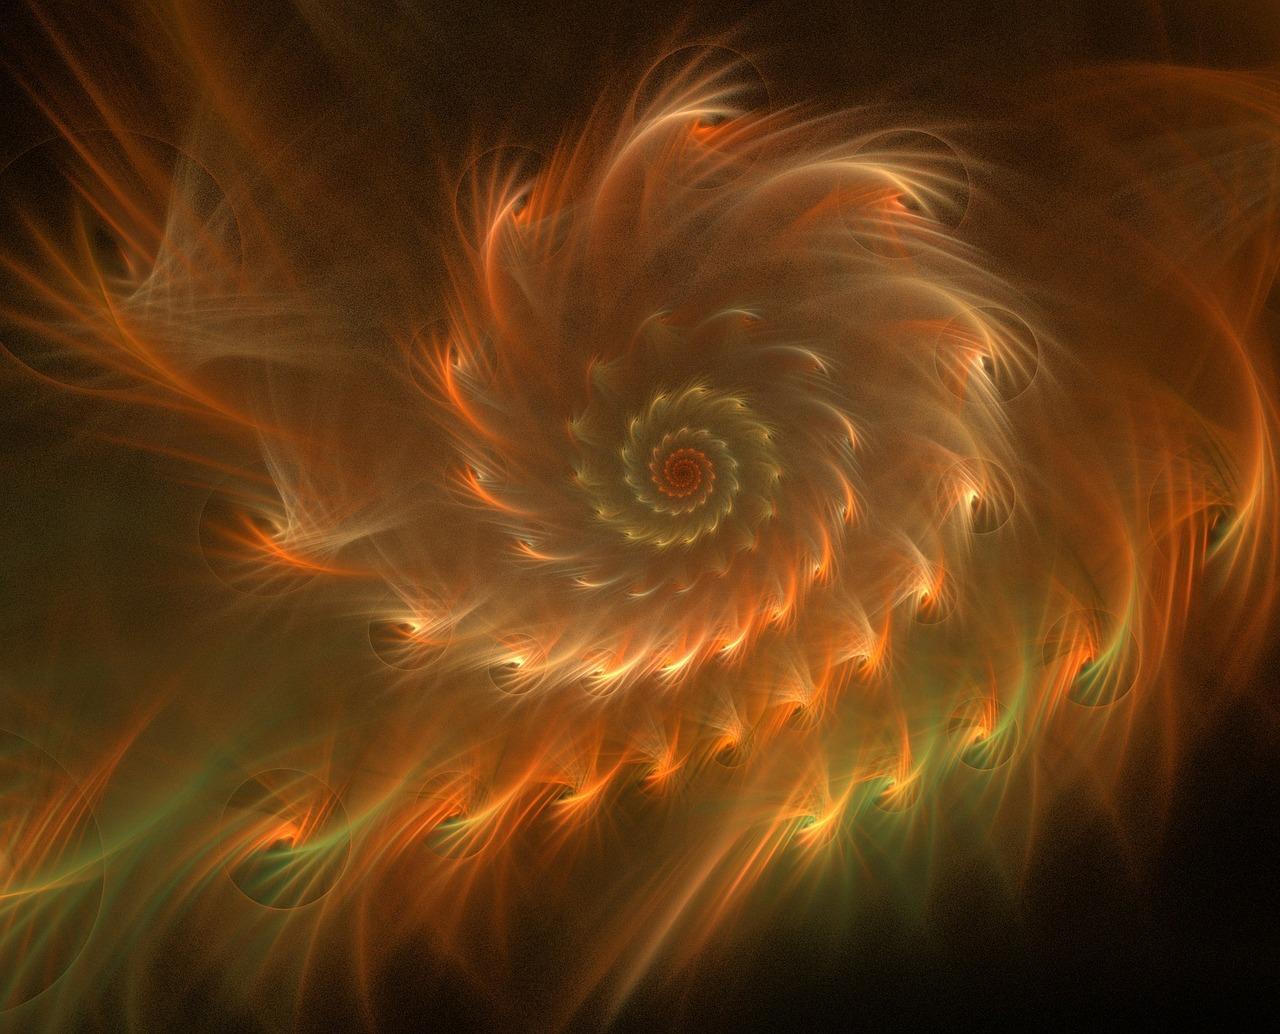 swirls-69963_1280